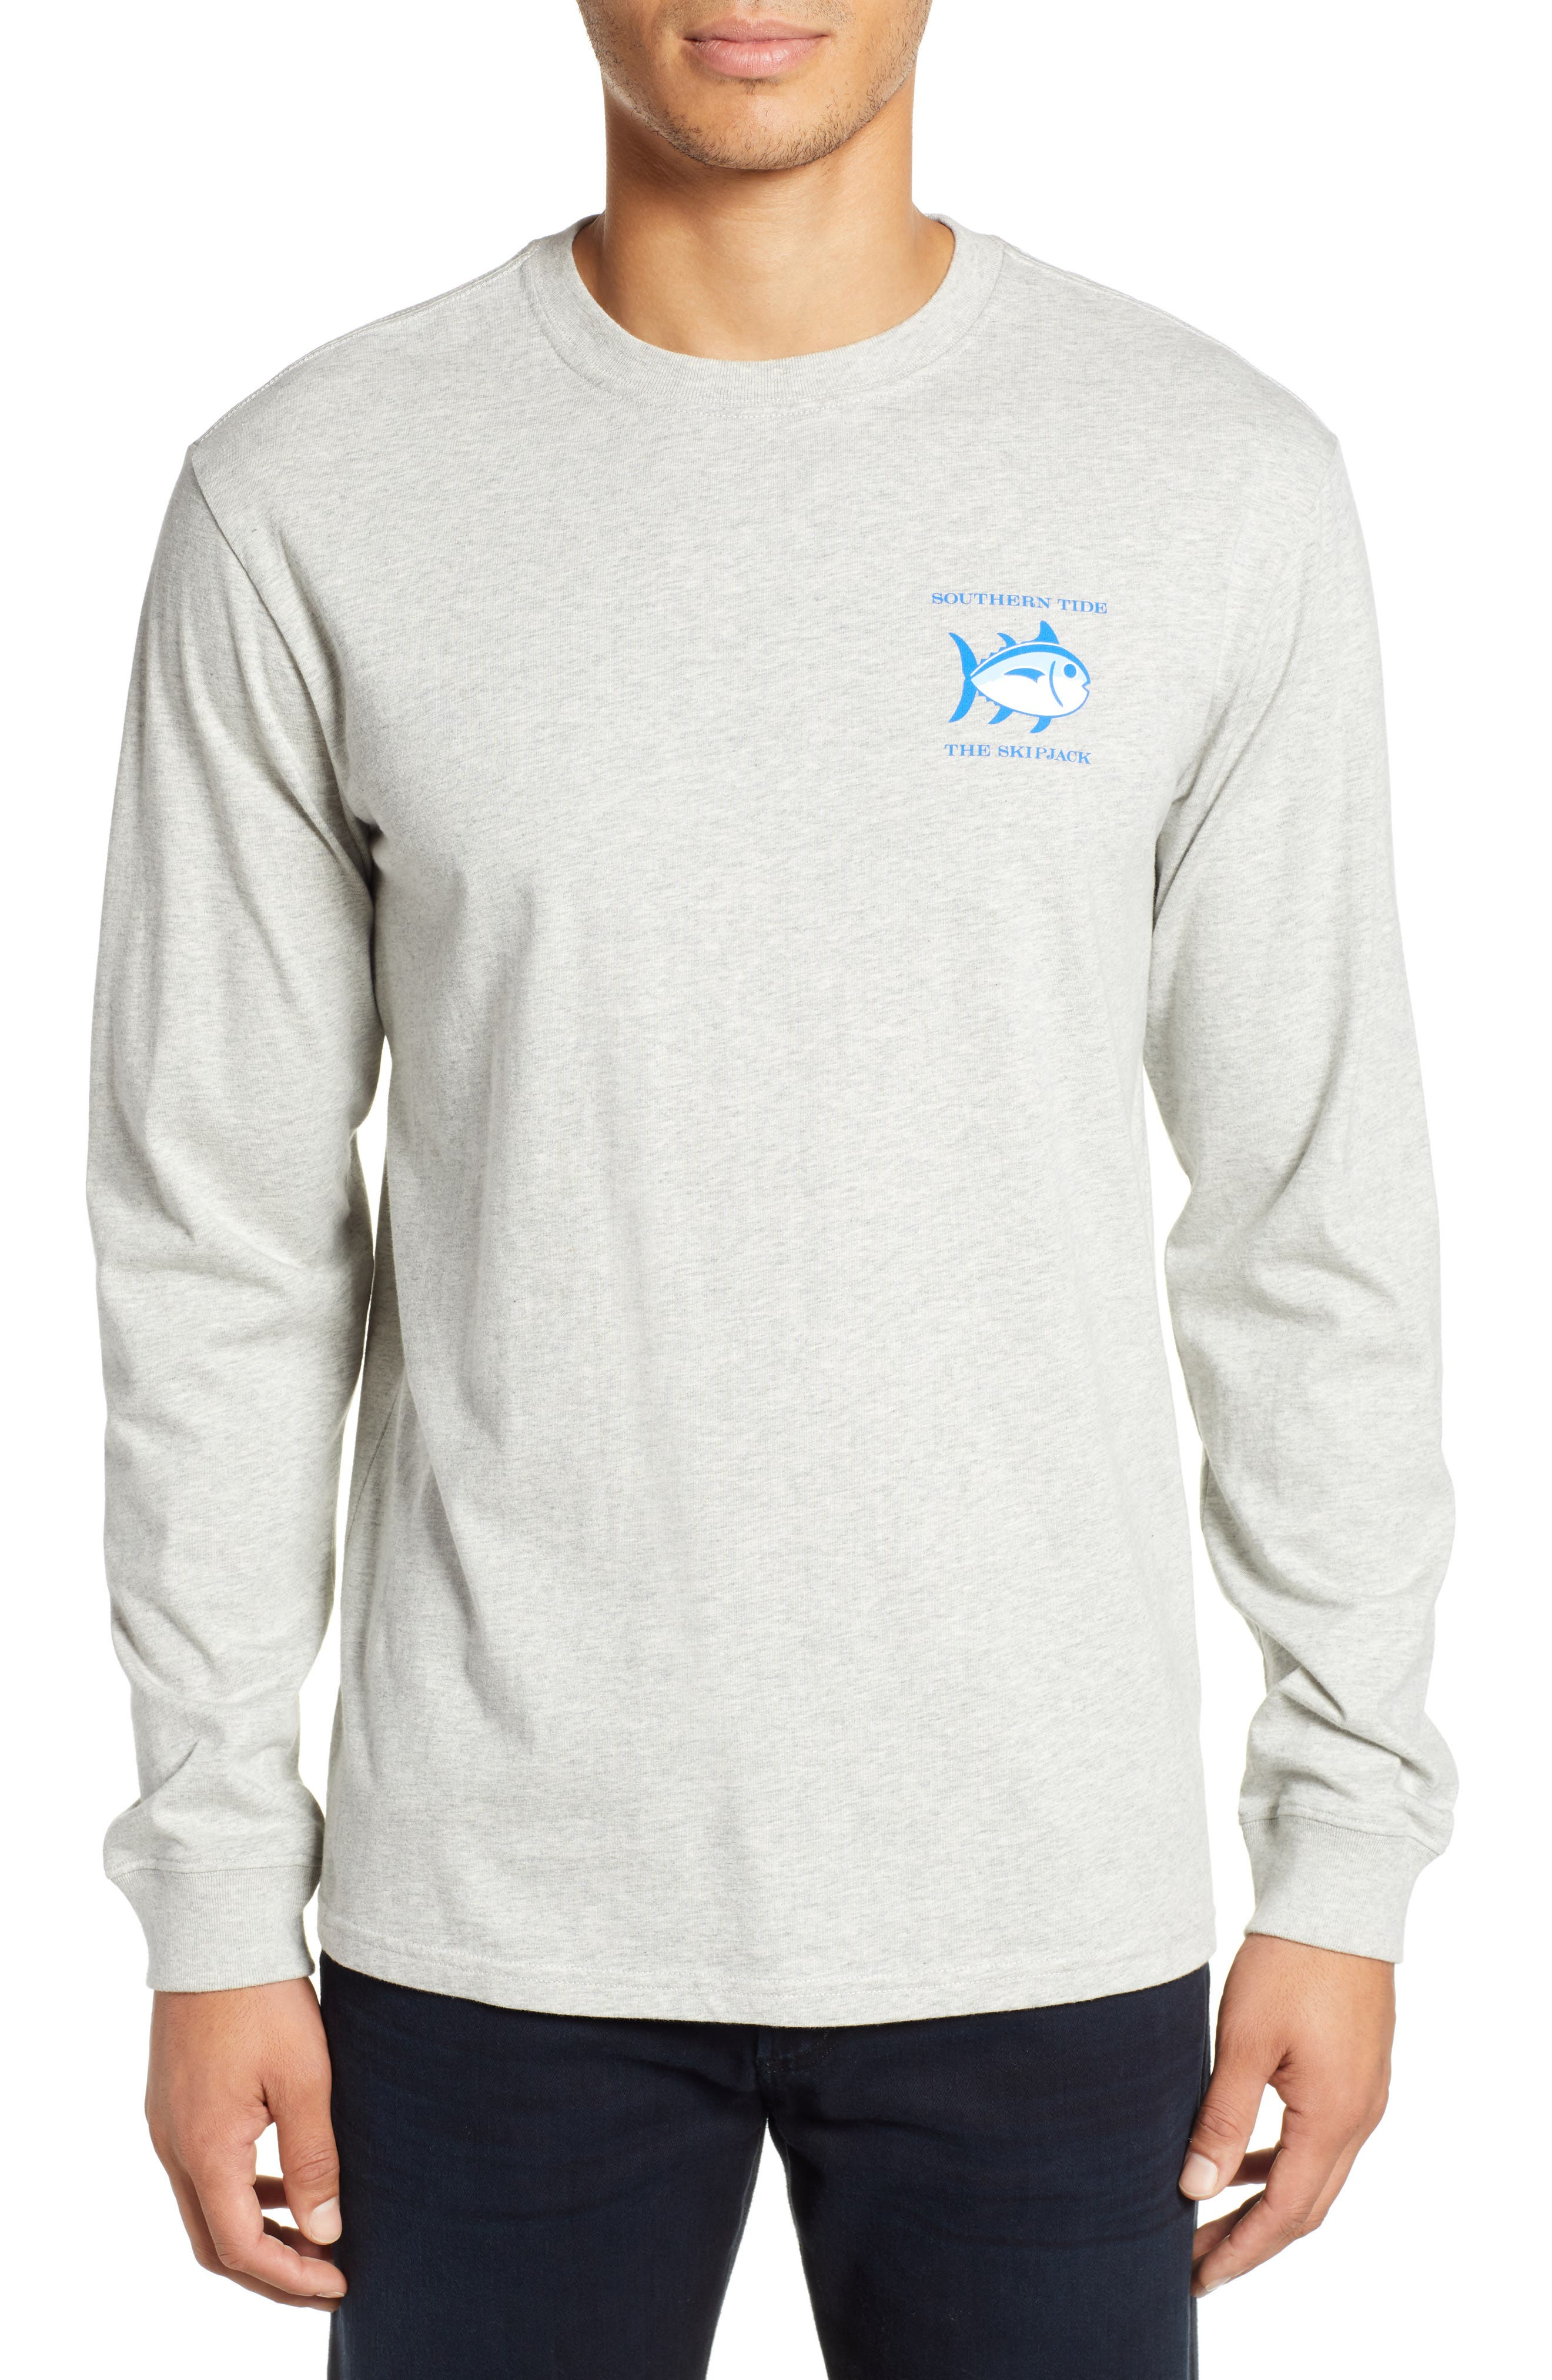 Original Skipjack T-Shirt,                         Main,                         color, LIGHT GREY